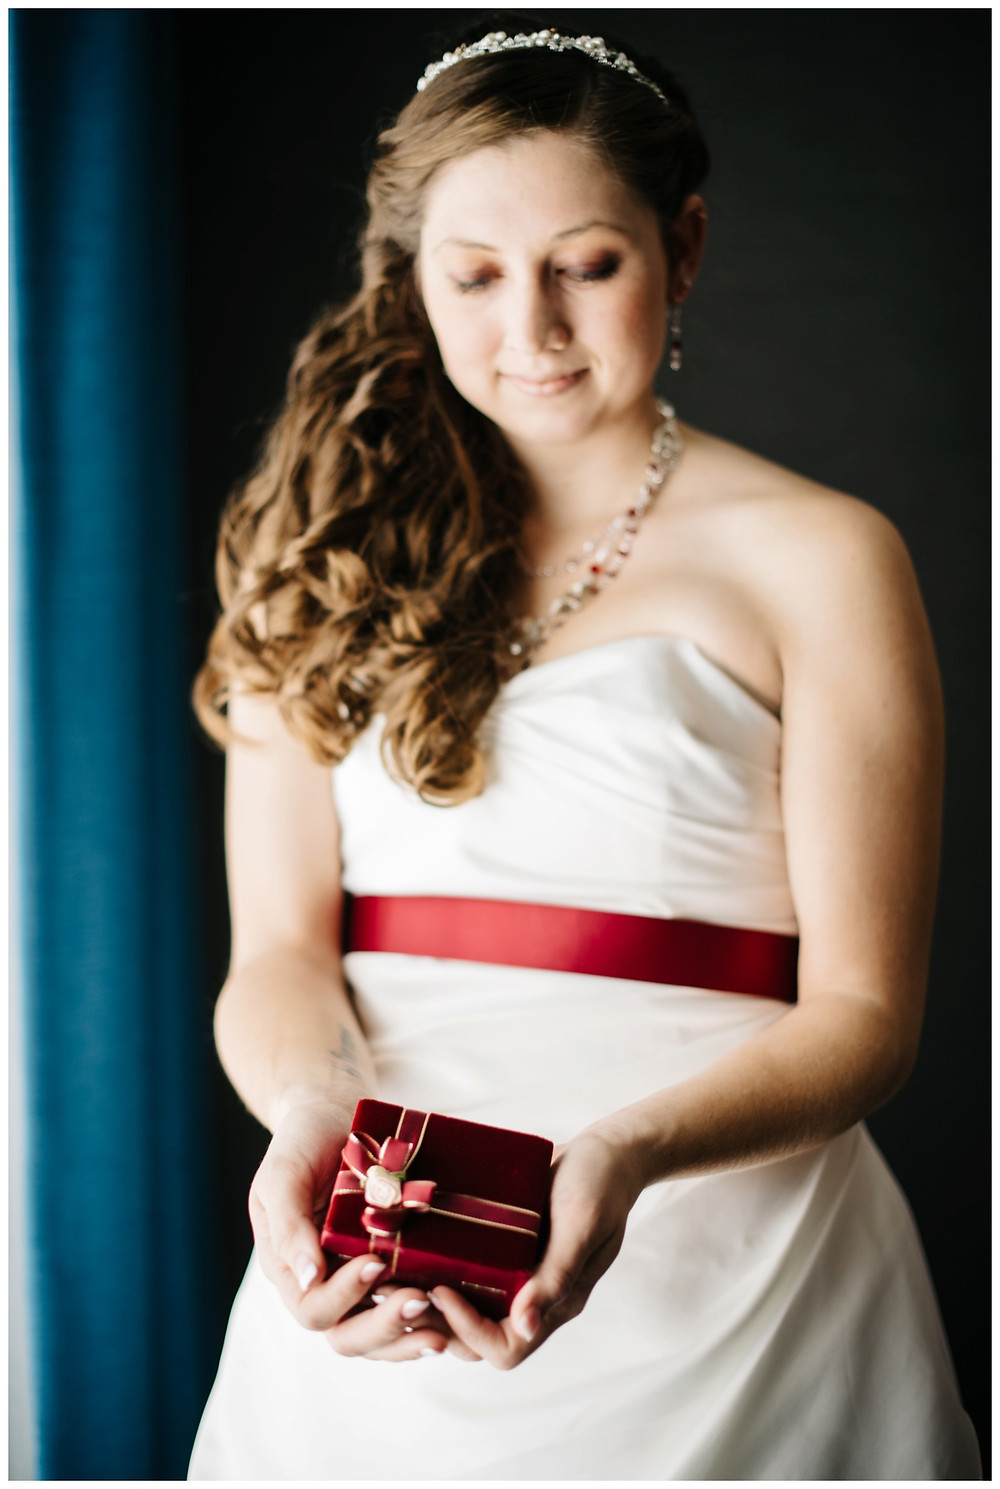 bride-holding-red-ribboned-gift-at-milwaukee-wedding-by-green-bay-wedding-photographer-kyra-rane-photographer